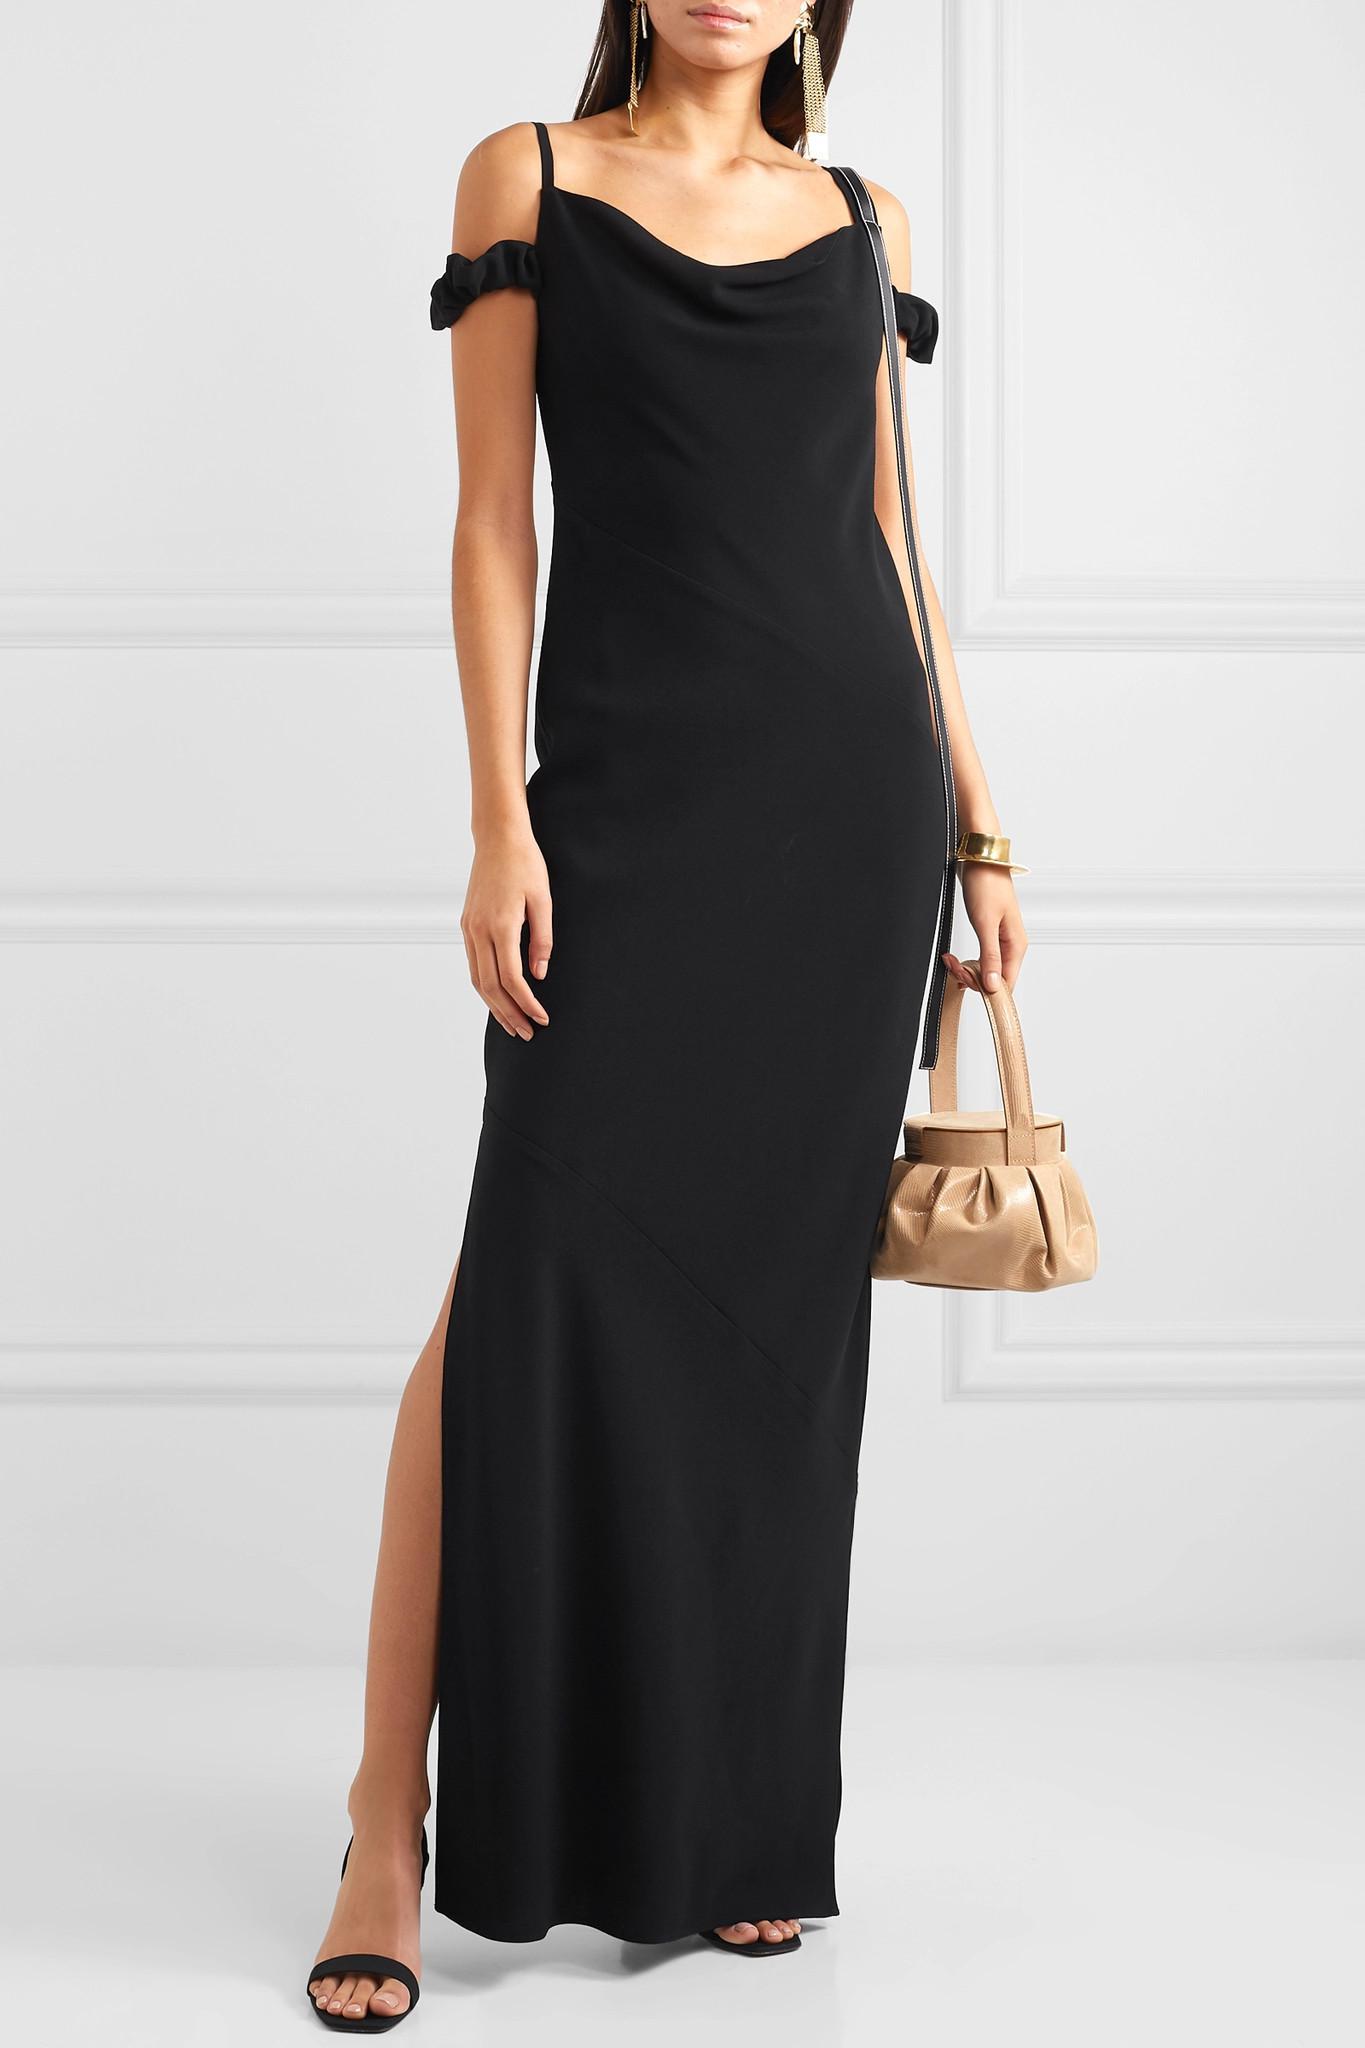 Loewe - Black Crêpe Maxi Dress - Lyst. View fullscreen 46ea36b76